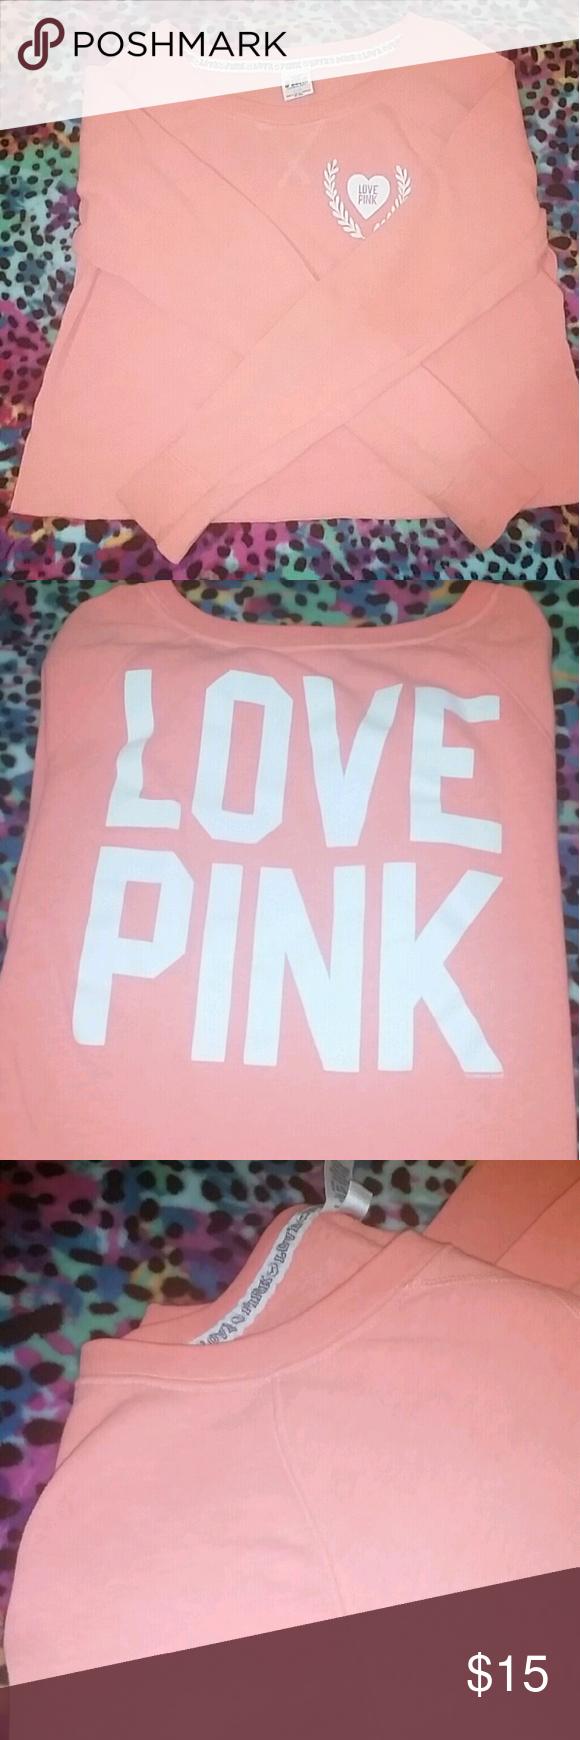 Top-design-bilder crop top sweater pink vs size l final price